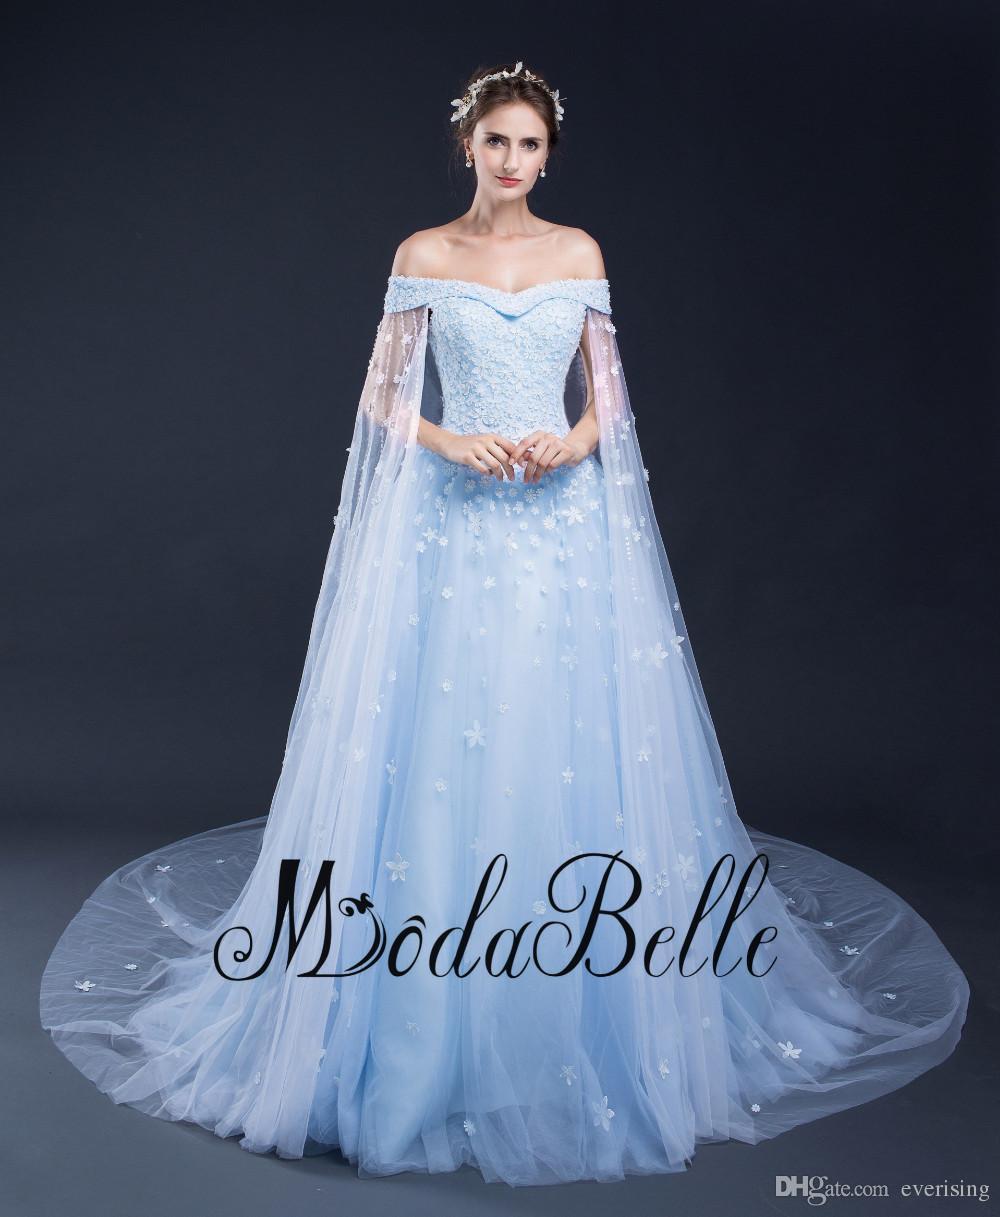 2017 New Arrvial Plus Size Wedding Dress Light Blue Flowers Pearls Sequins  Vestido De Novia Sweetheart Bridal Gowns Lace Wedding Dress Lace Wedding ...